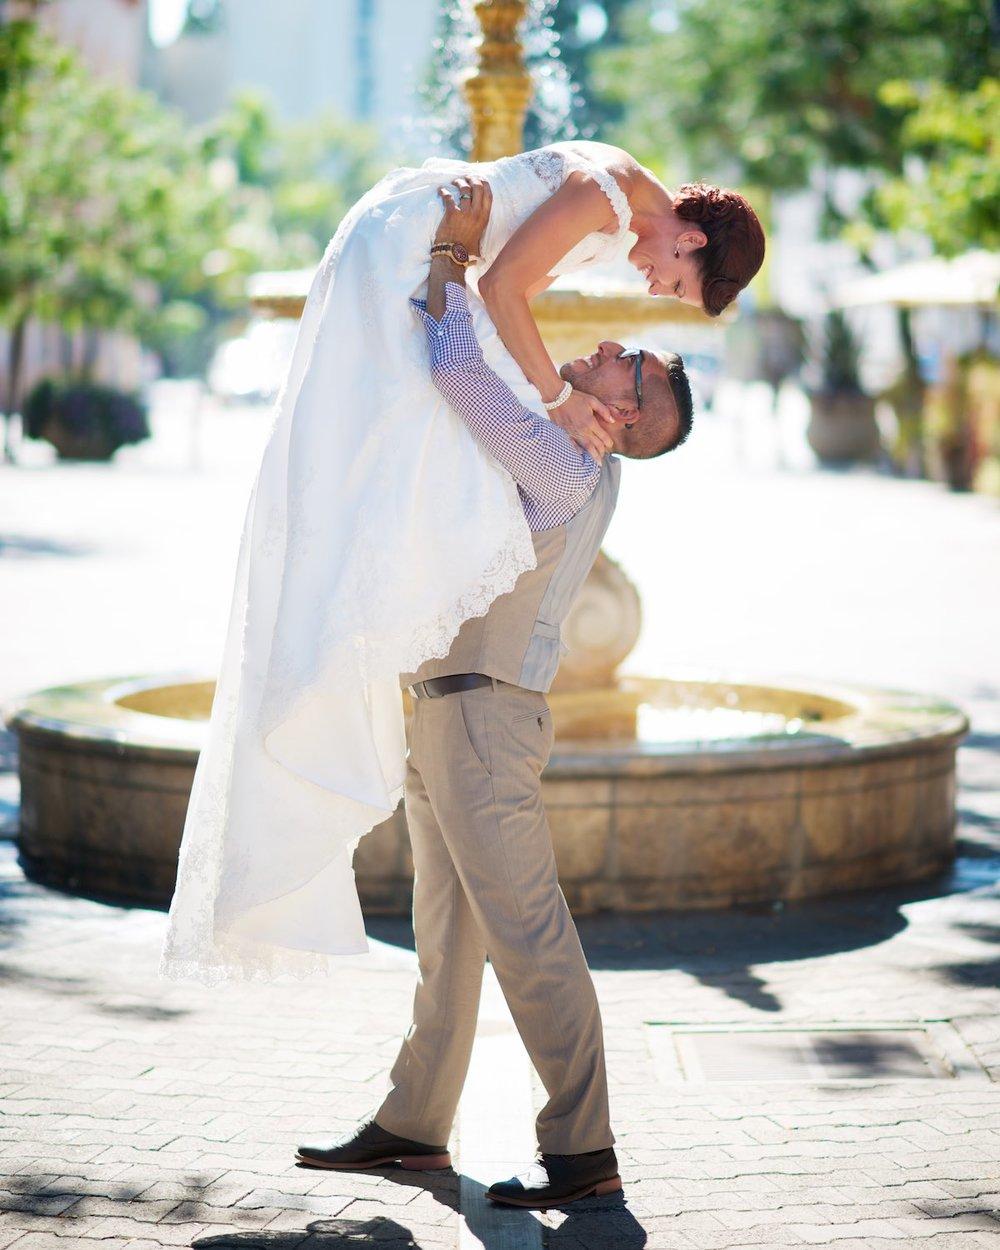 anta-ana-wedding-michal-pfeil-10.jpg